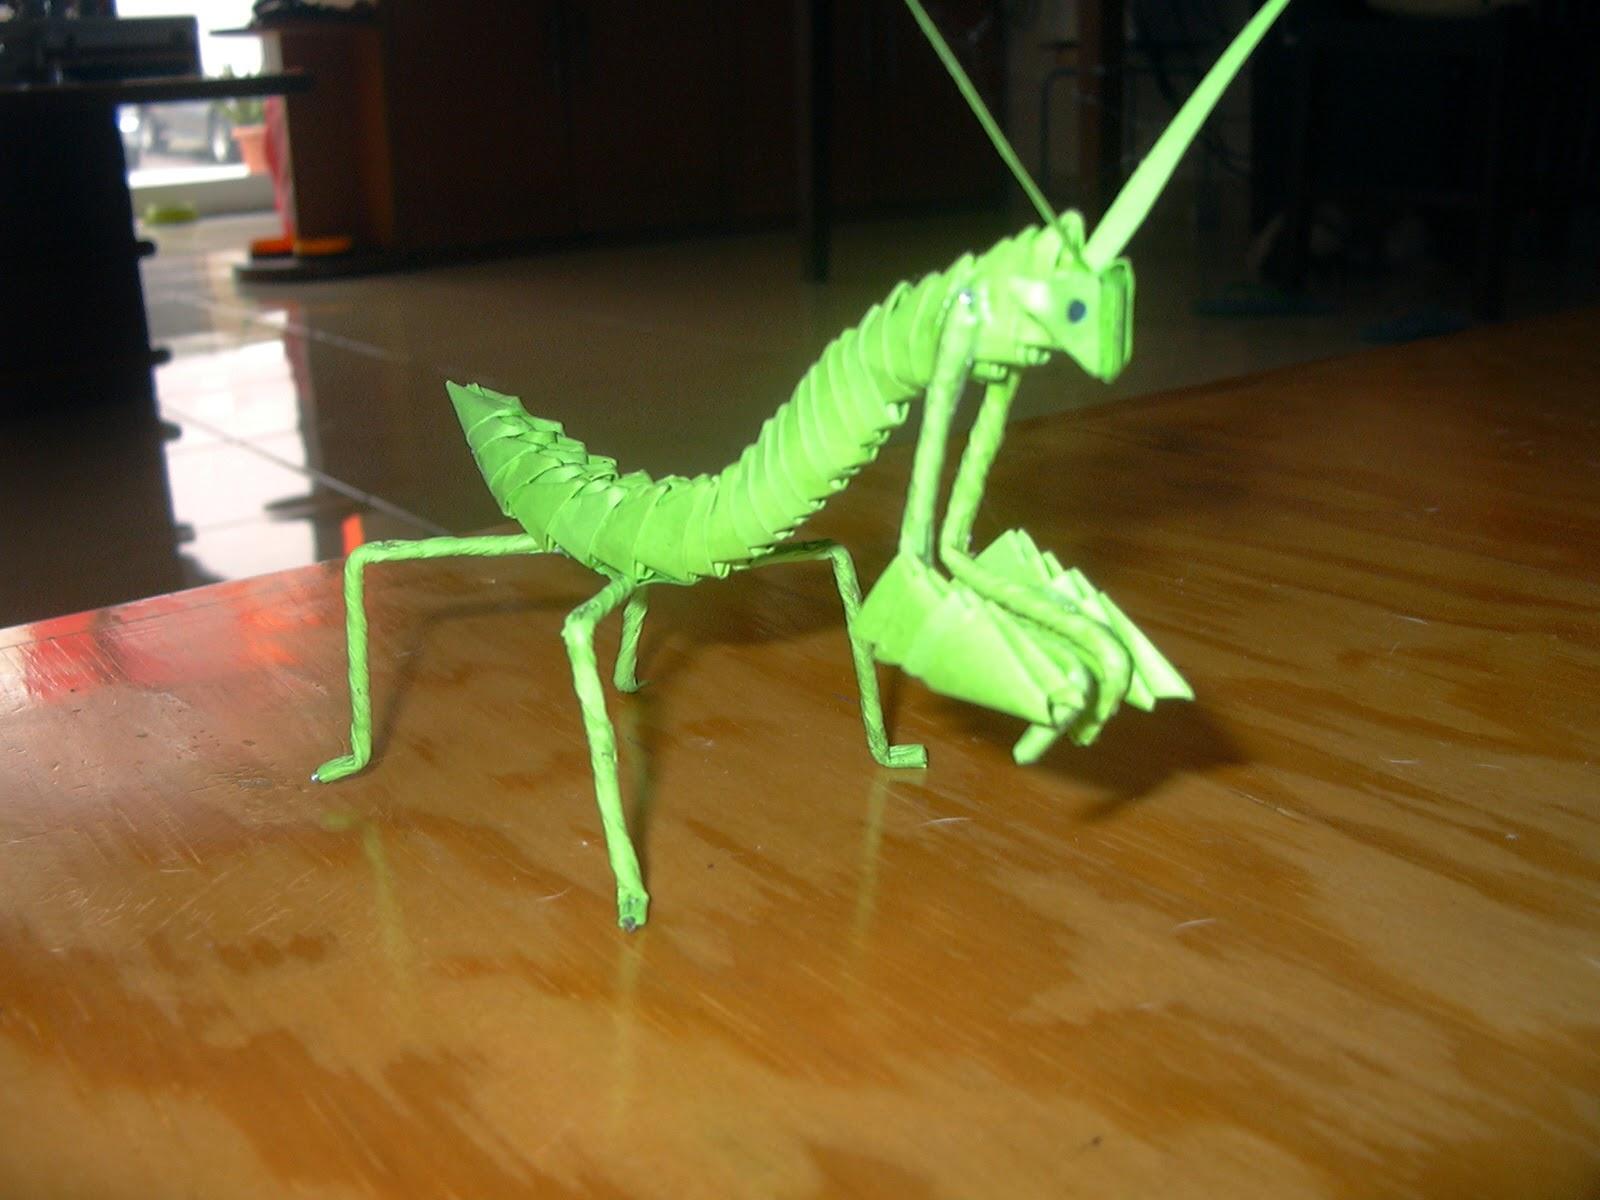 ICHANOKO 3D ORIGAMI INDONESIA: Model 3d origami - ANIMALS - photo#32